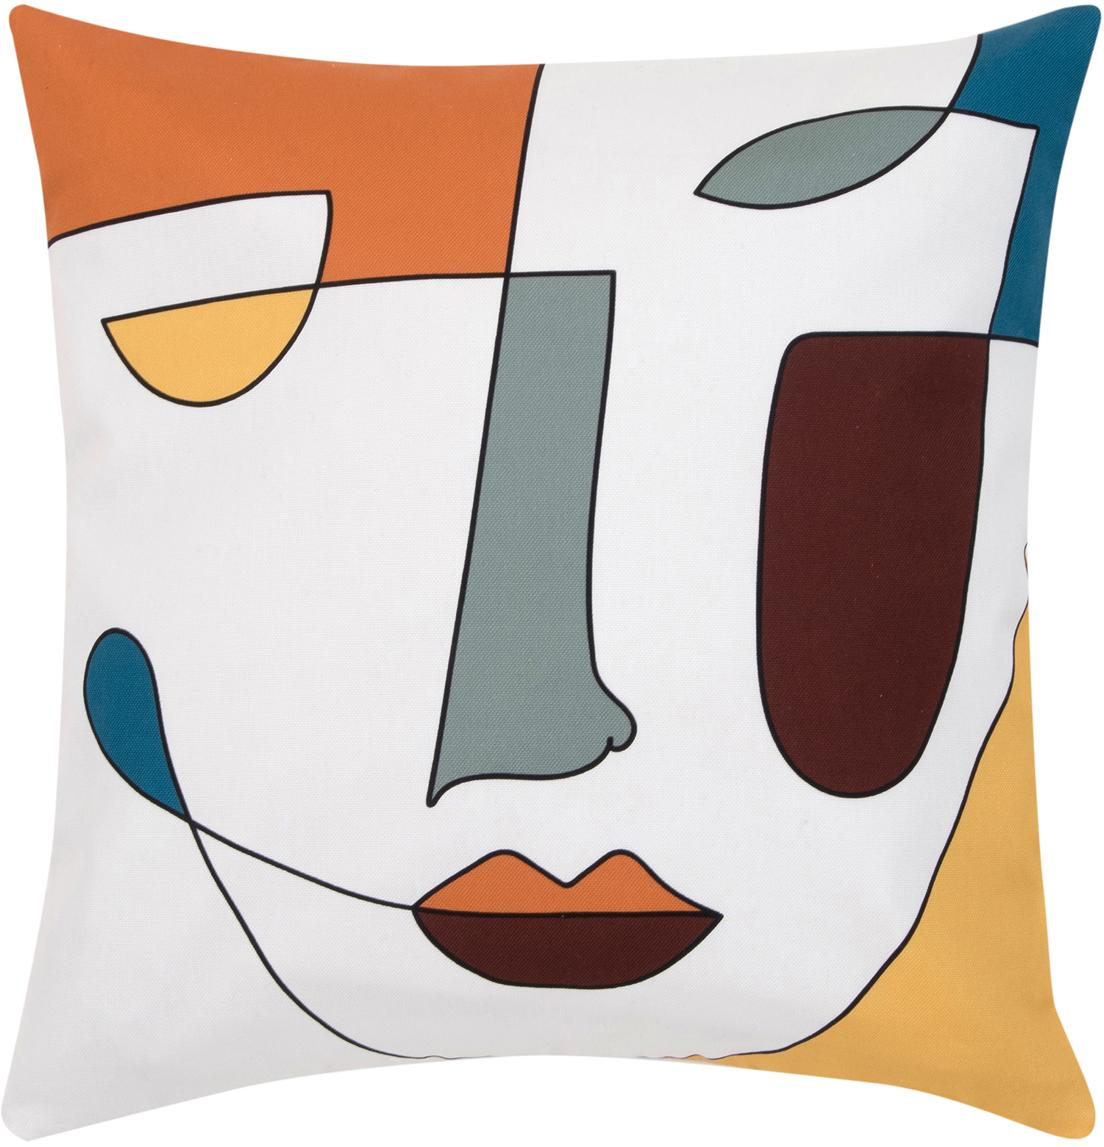 Kussenhoes Adriano, Weeftechniek: panama, Wit, multicolour, 40 x 40 cm